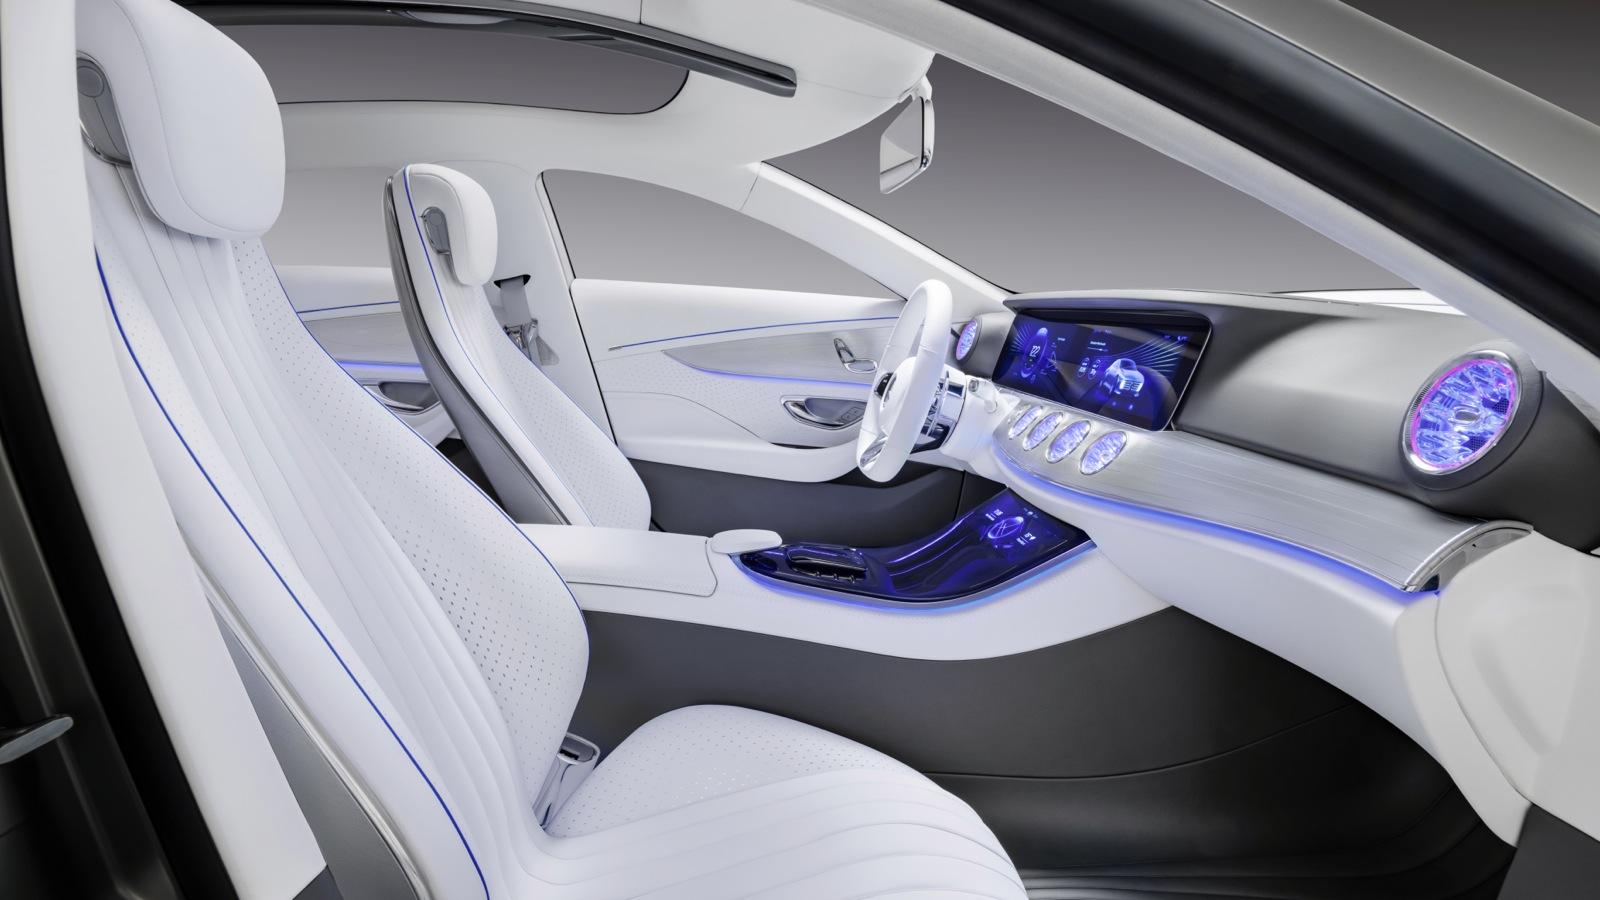 2016 mercedes benz e class interior previewed by concept for E interior design